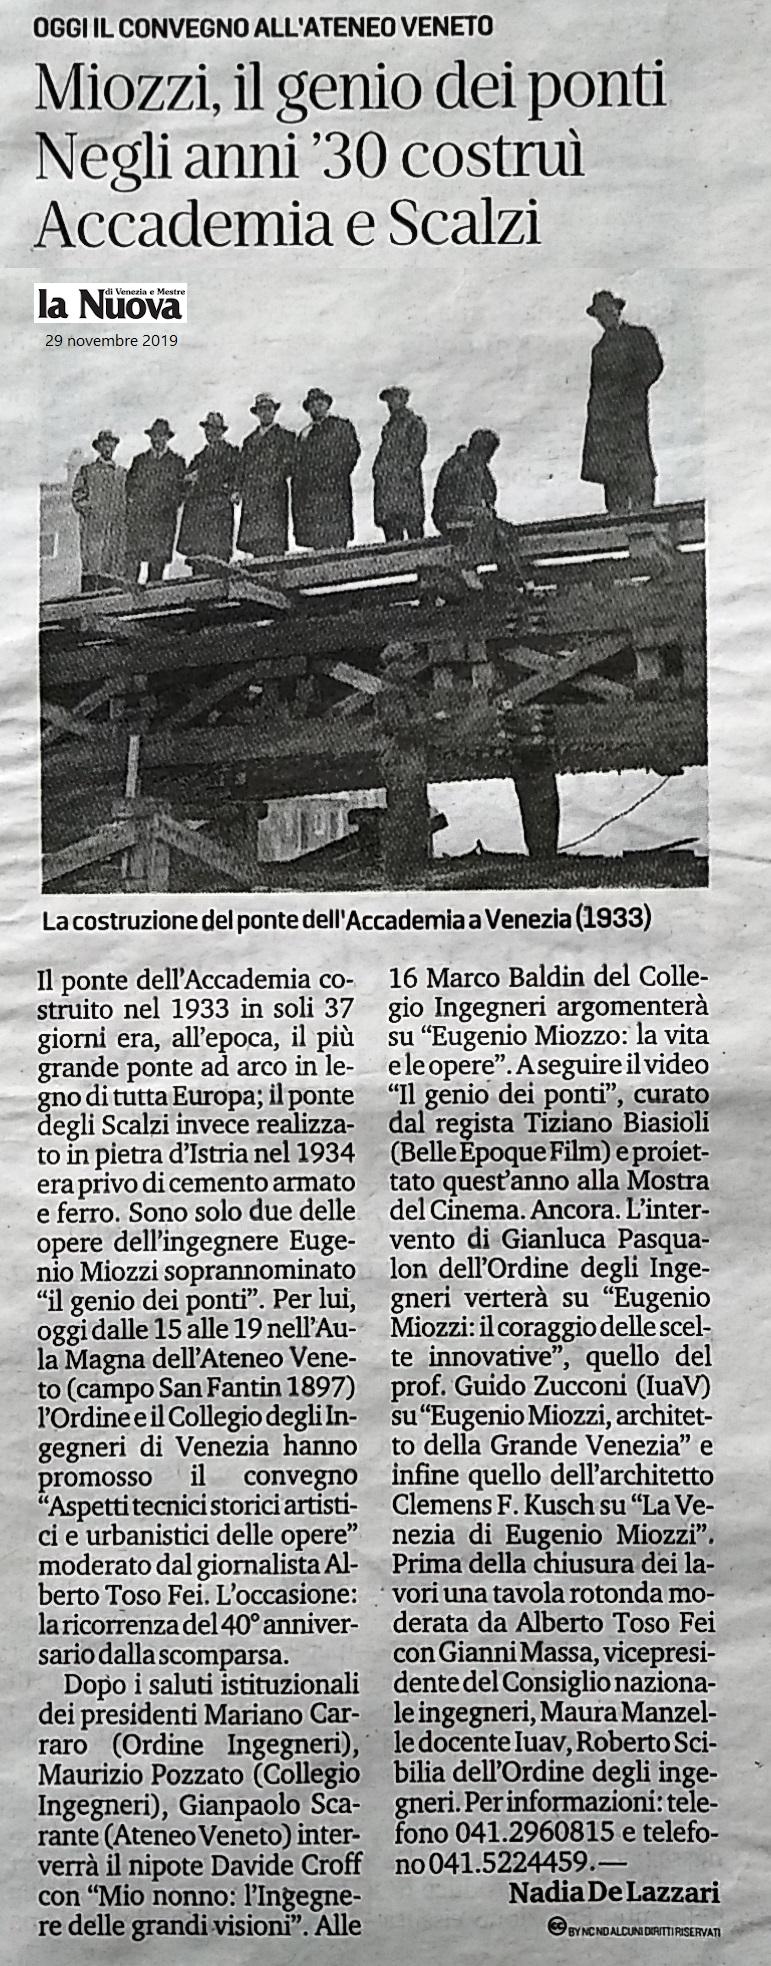 29.11.2019 la Nuova Venezia - Seminario Ing. Miozzi Ordine e Collegio Ingegneri Venezia.jpg